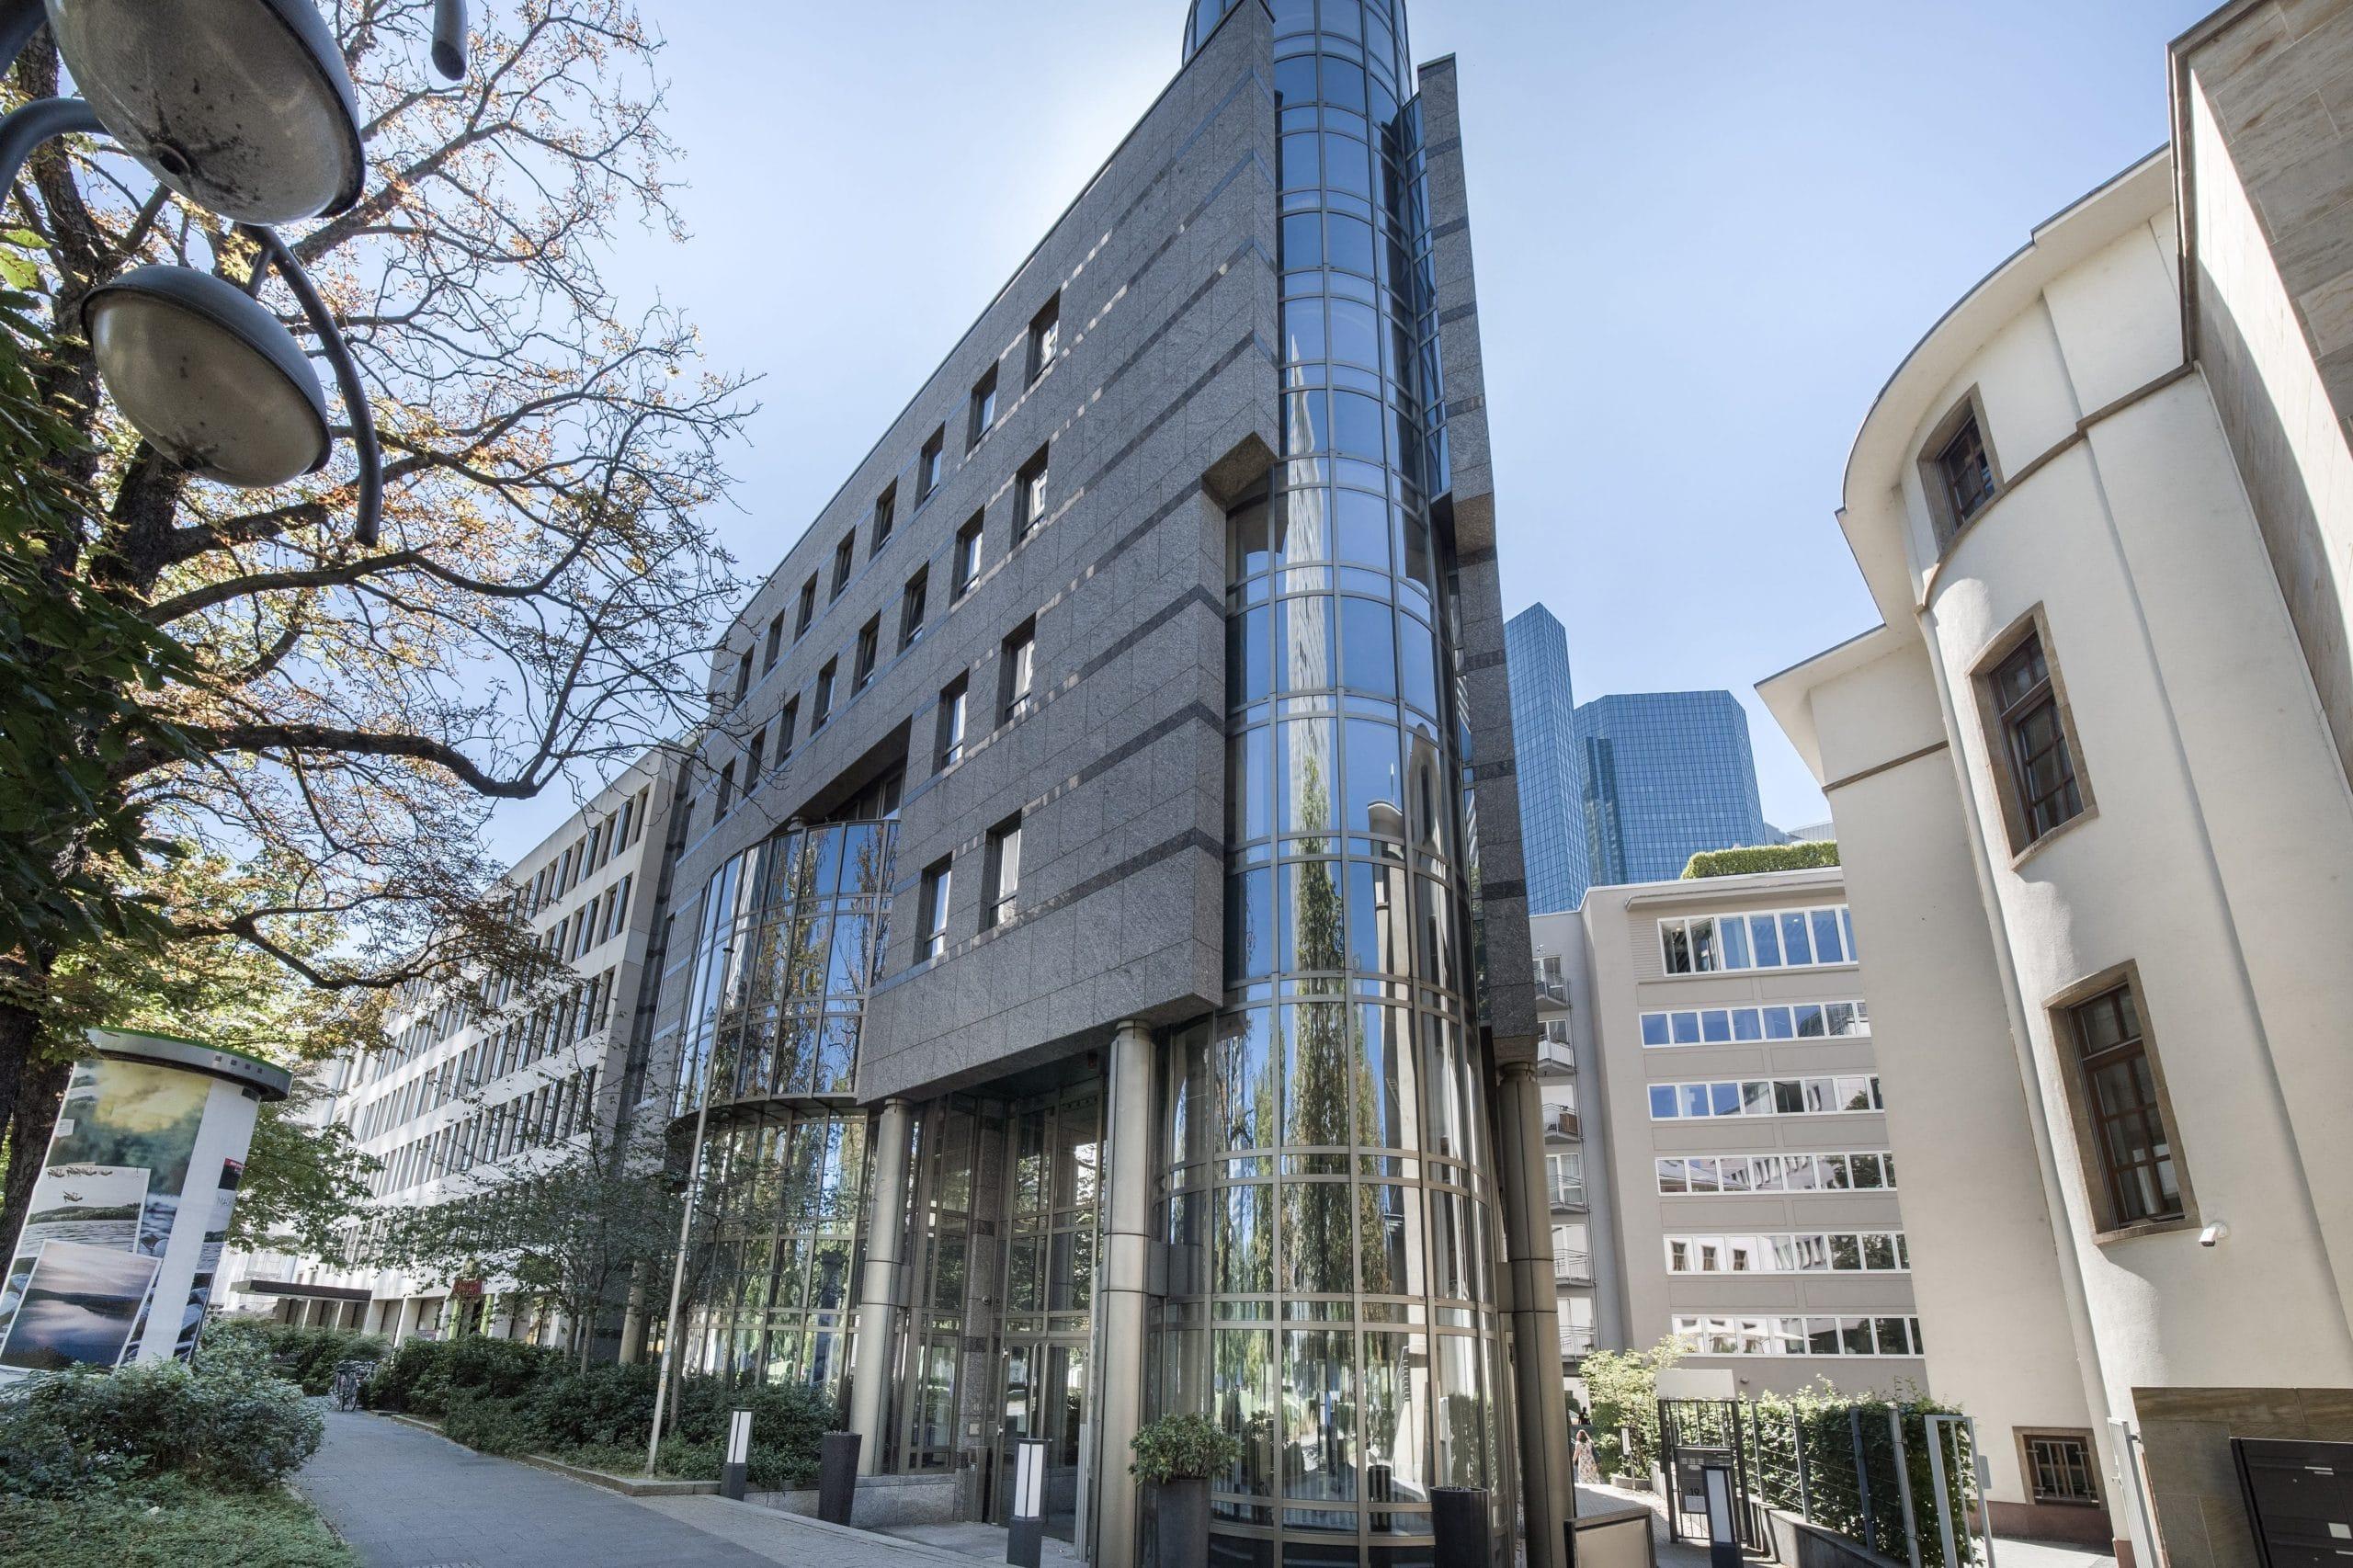 FUE Haartransplantation in Frankfurt